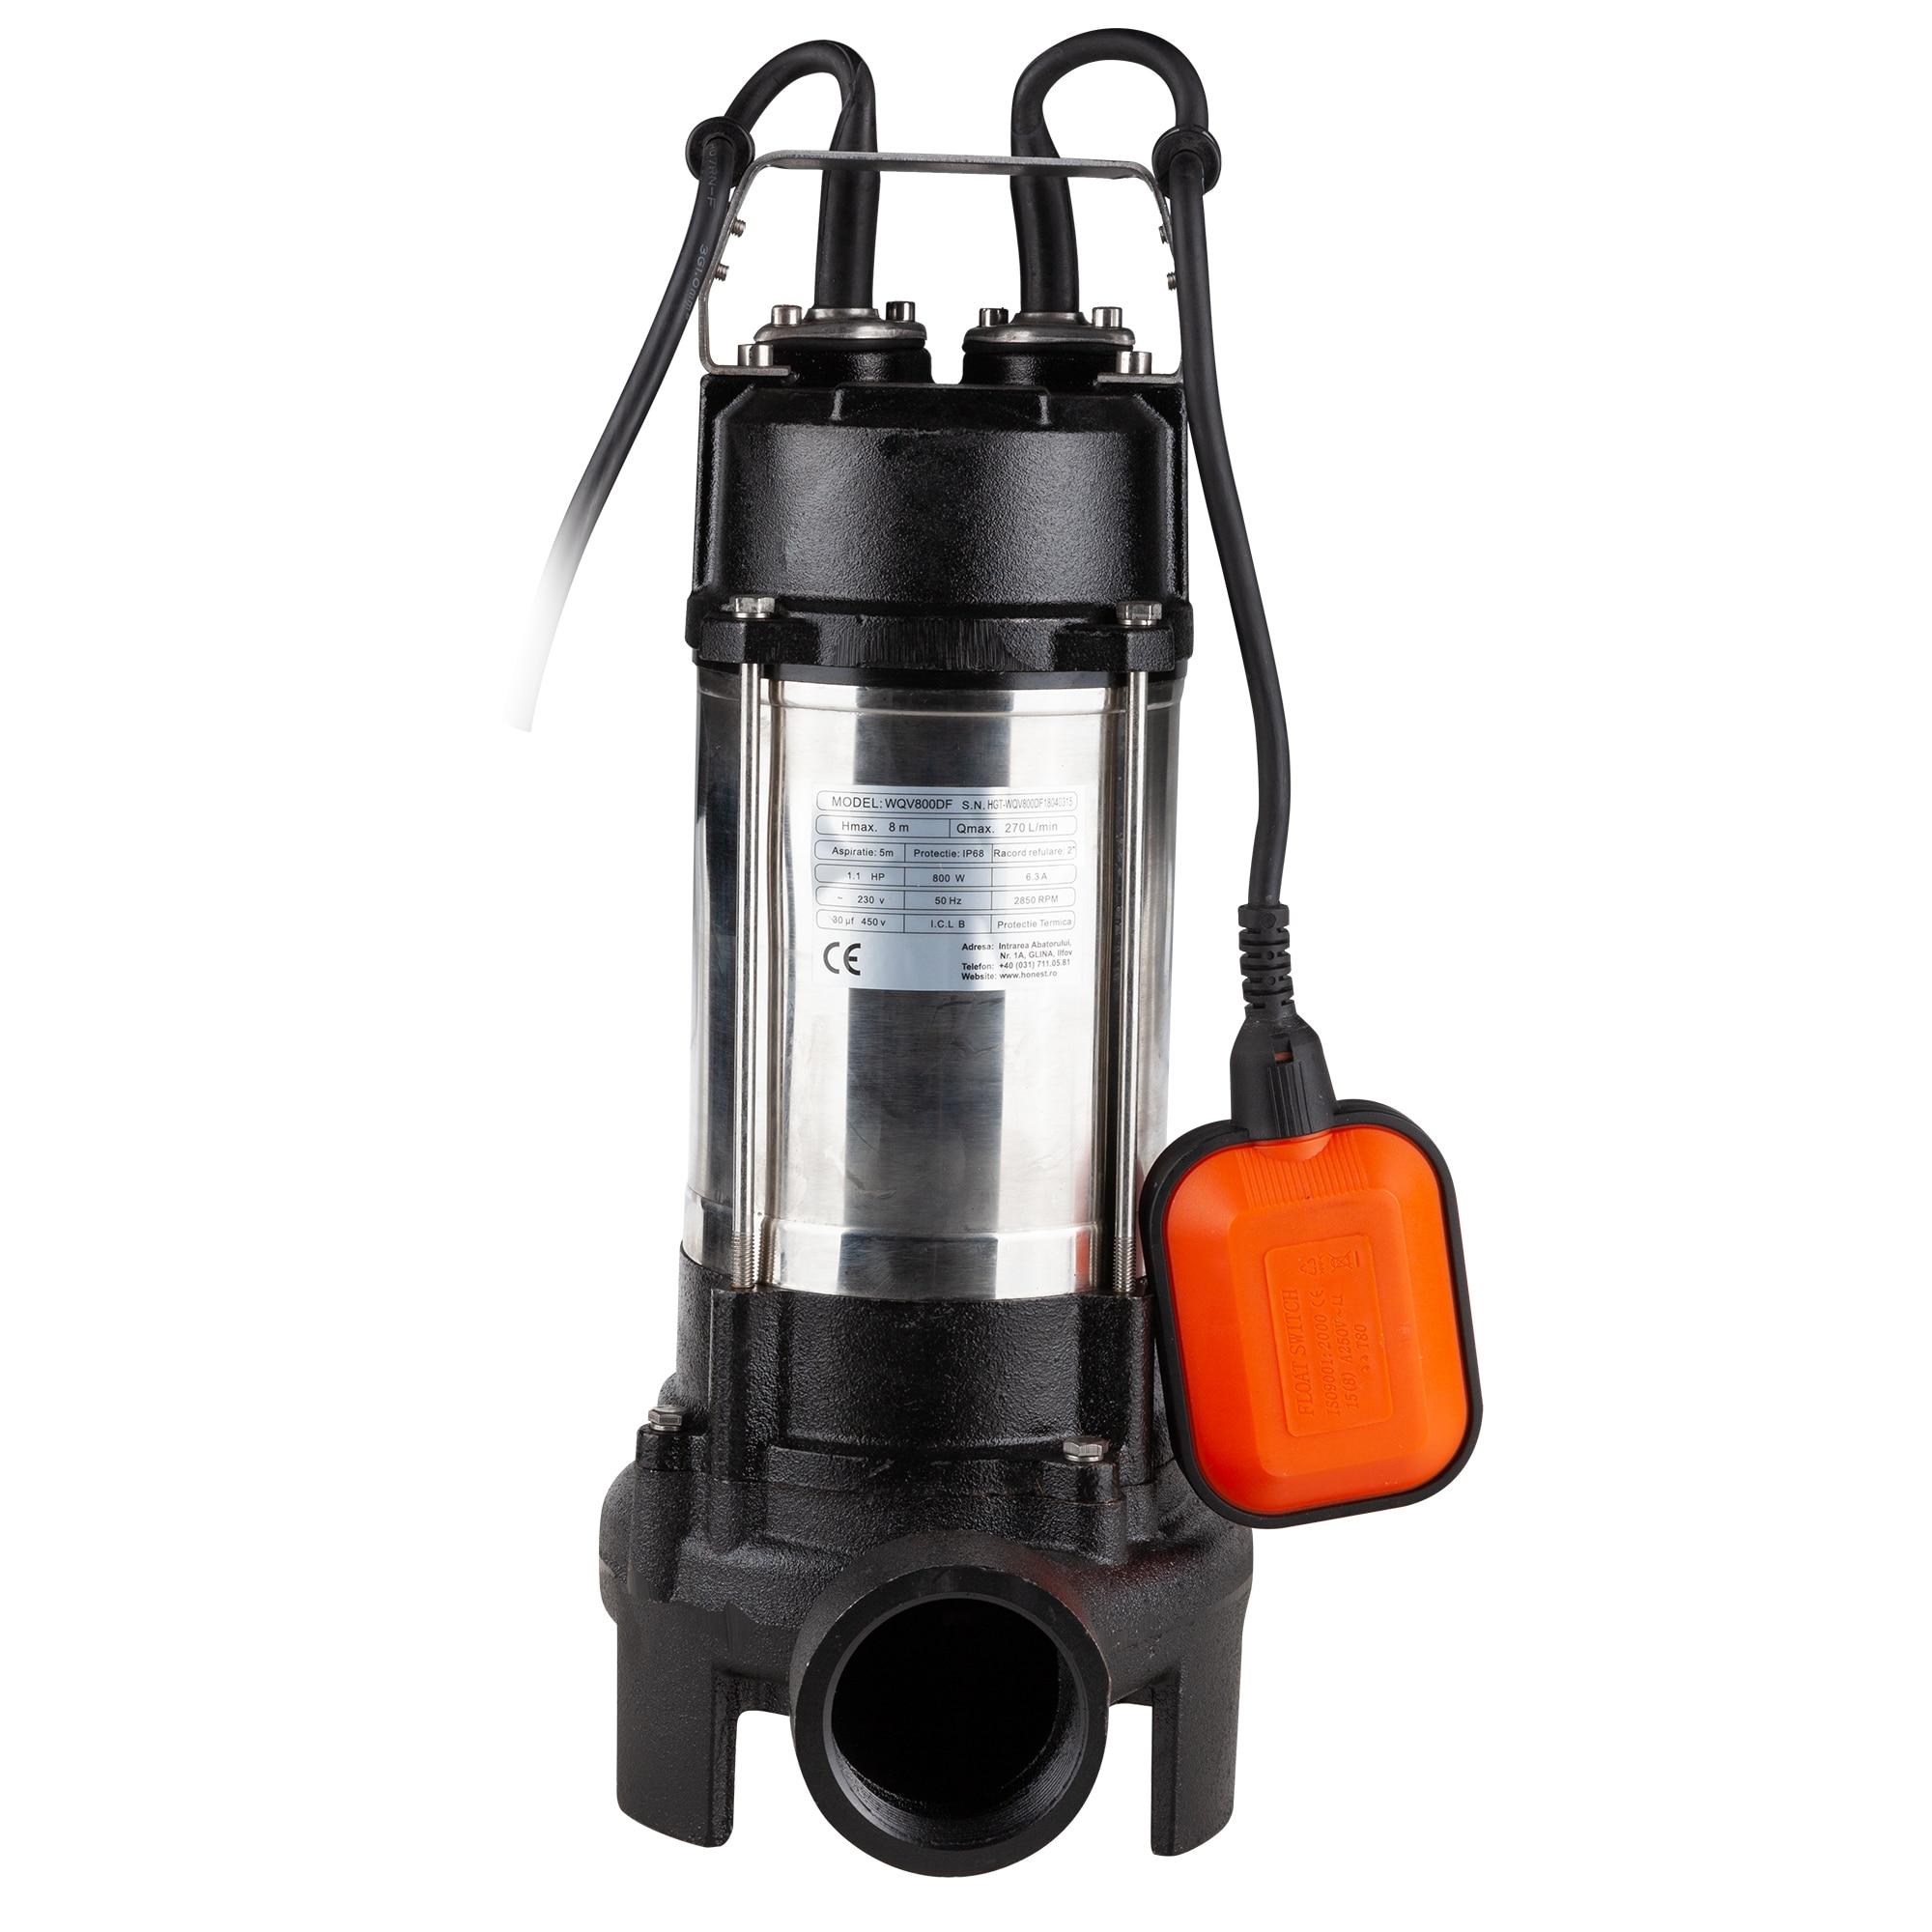 "Fotografie Pompa submersibila cu tocator Evotools, 800W, adancime max 5 m, Hmax 8 m, debit 270 l/min, racord refulare 2"", Inox"